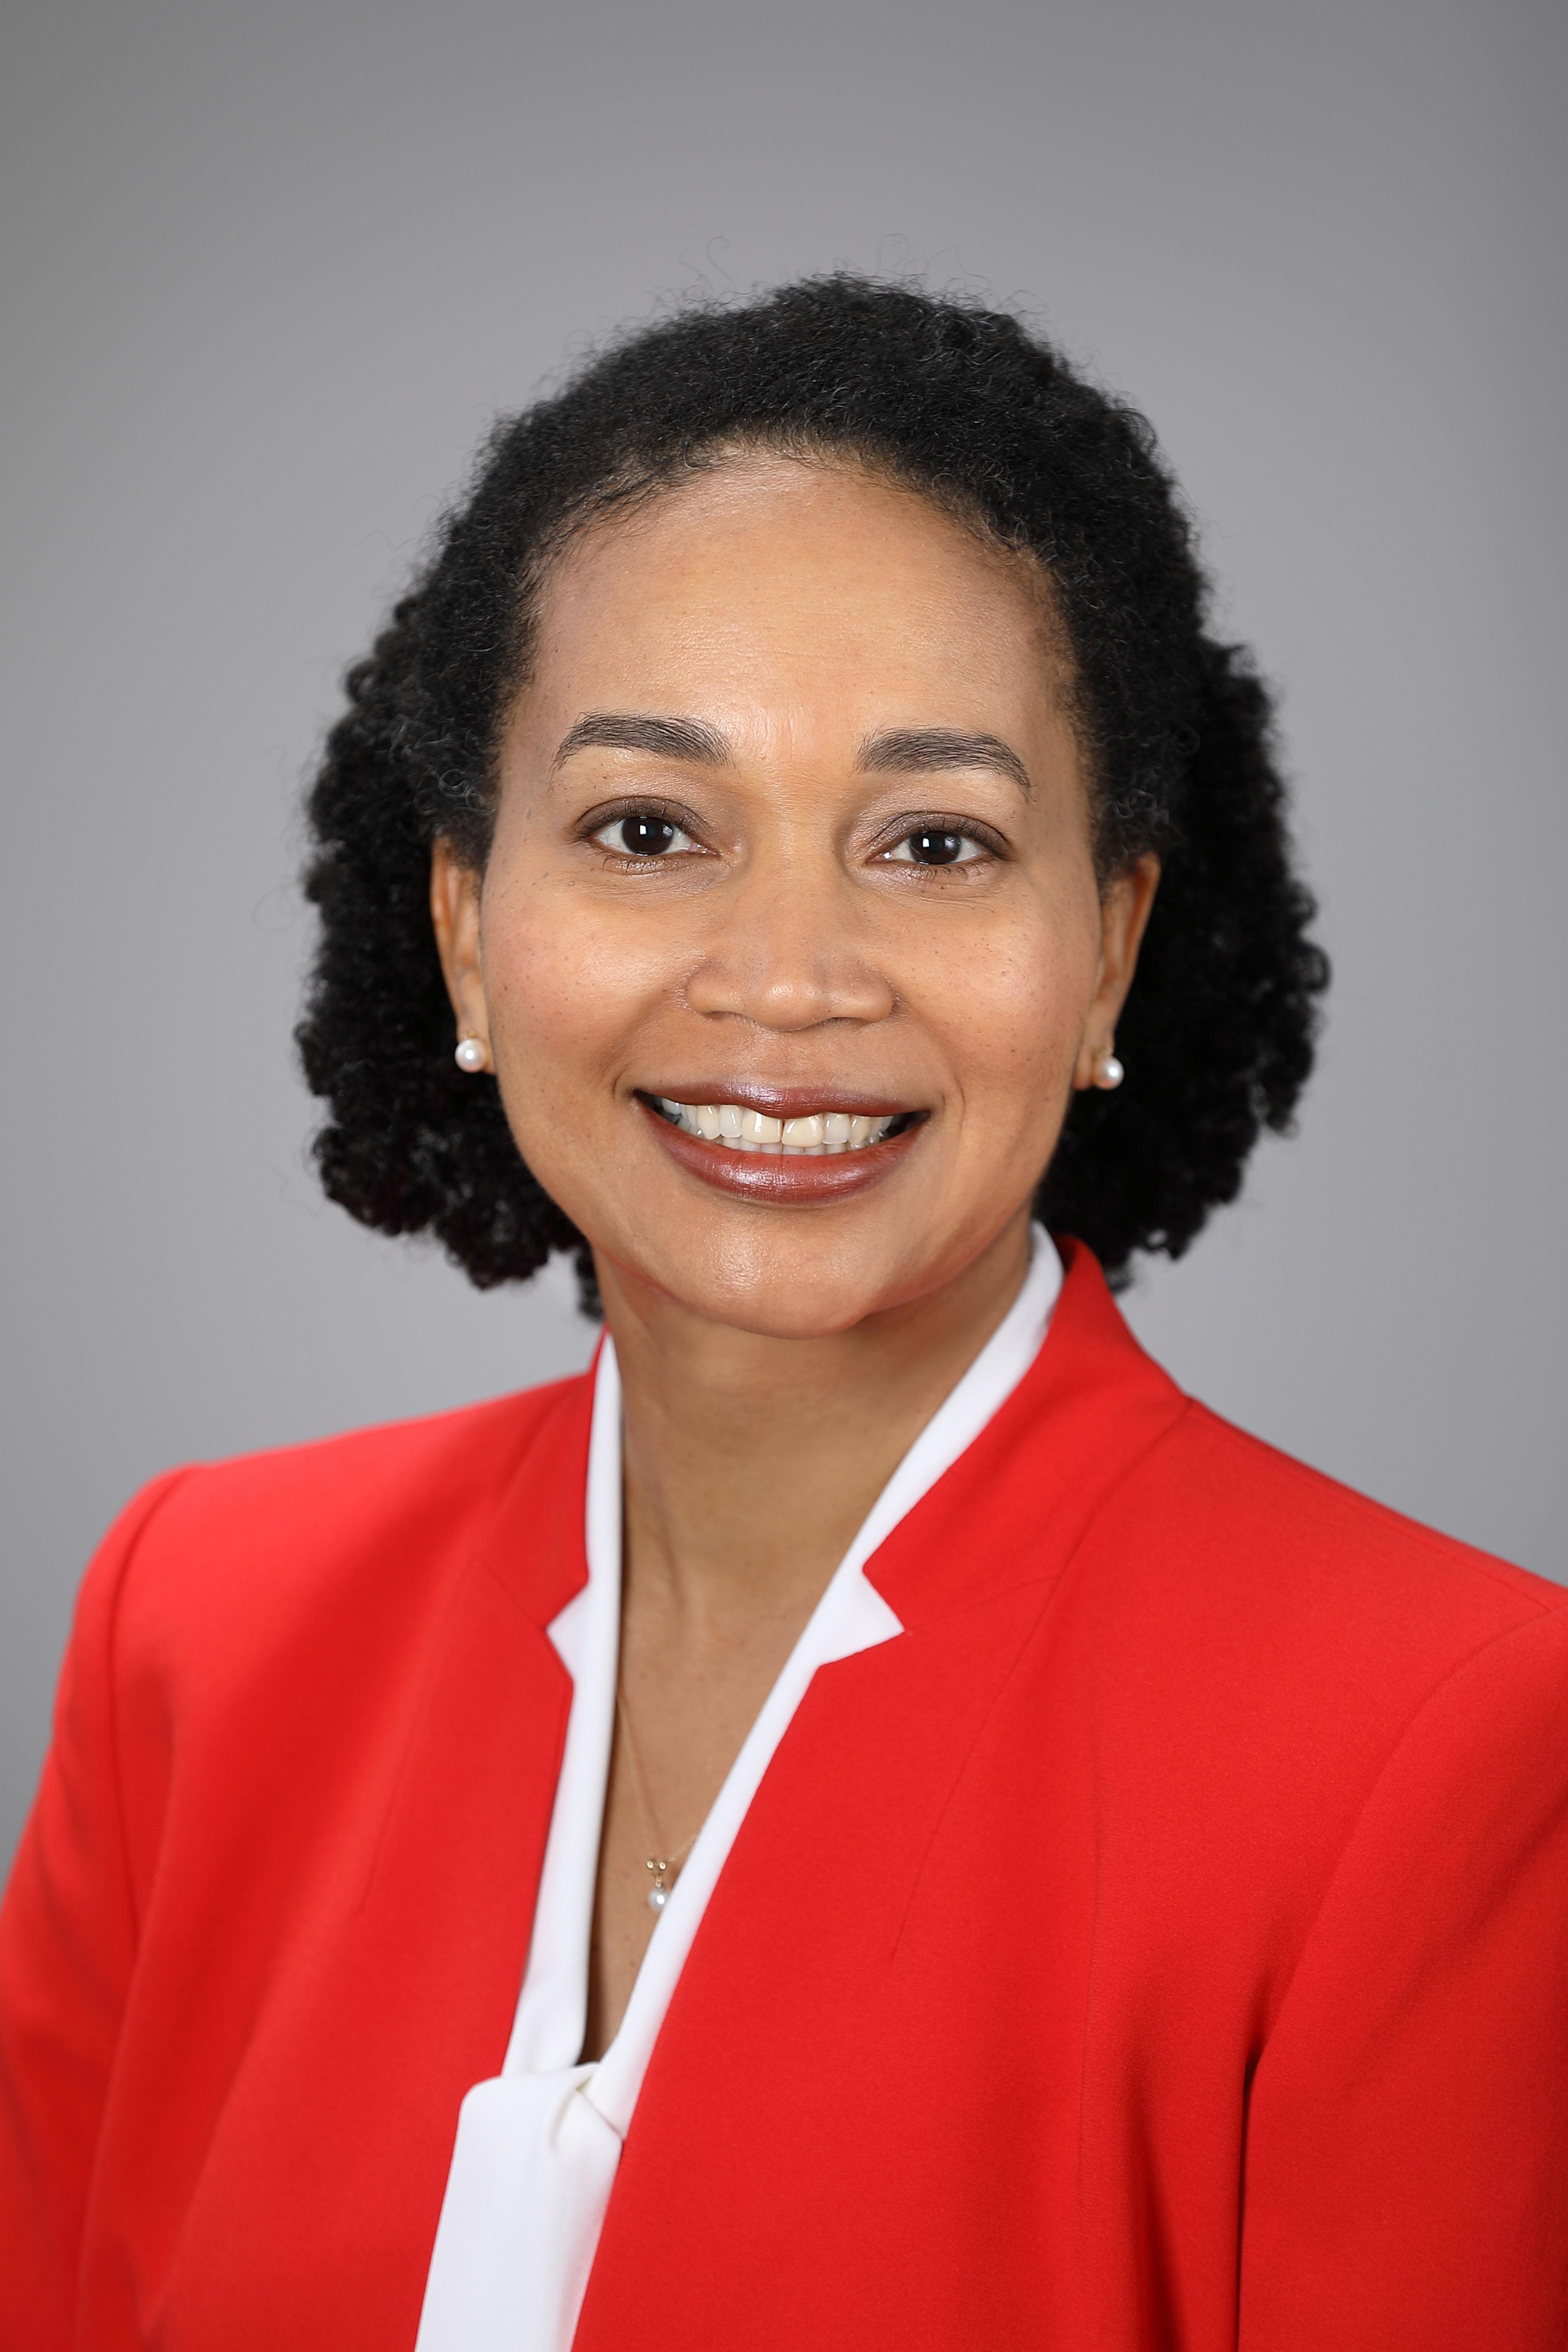 Nakela Cook